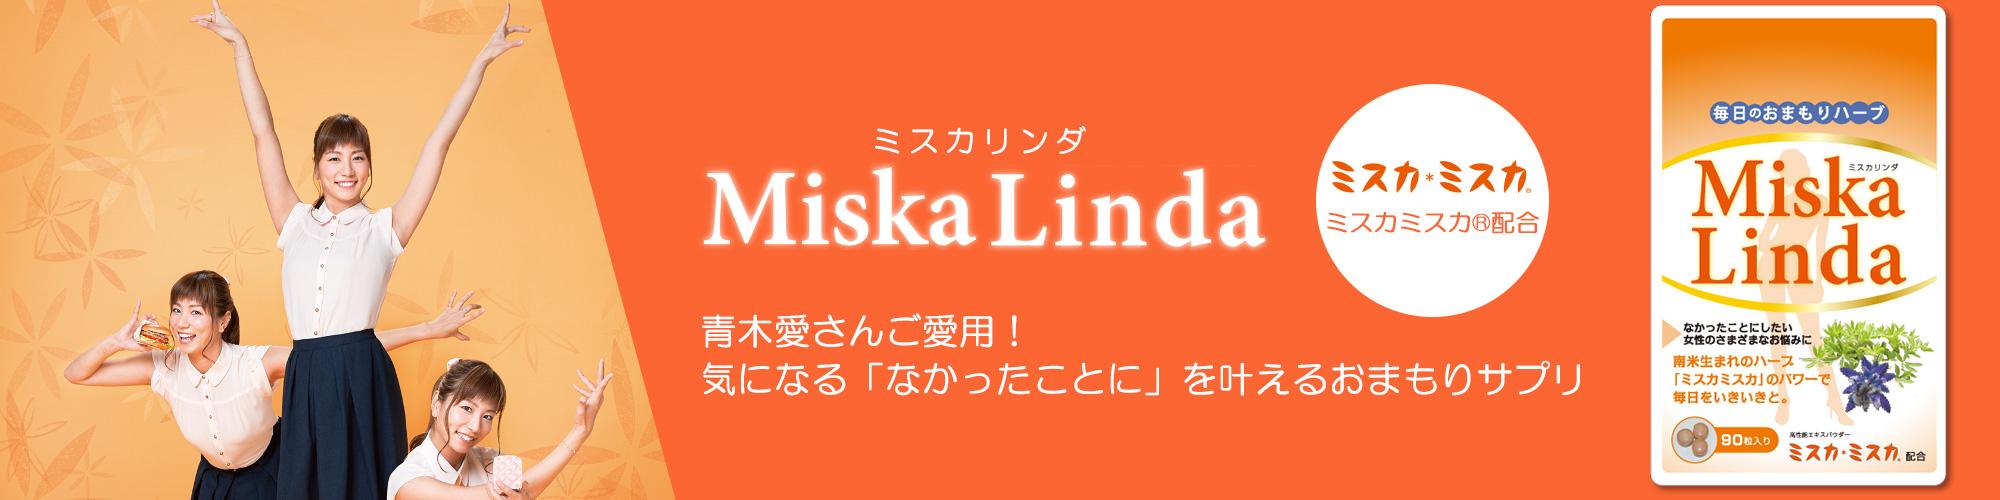 「MiskaLinda(ミスカリンダ)」は旅サラダなどテレビで活躍中の青木愛さんご愛用!腸内環境改善・便秘解消で食べ過ぎや紫外線・乾燥による肌荒れを「なかったことに」を叶えるおまもりサプリ